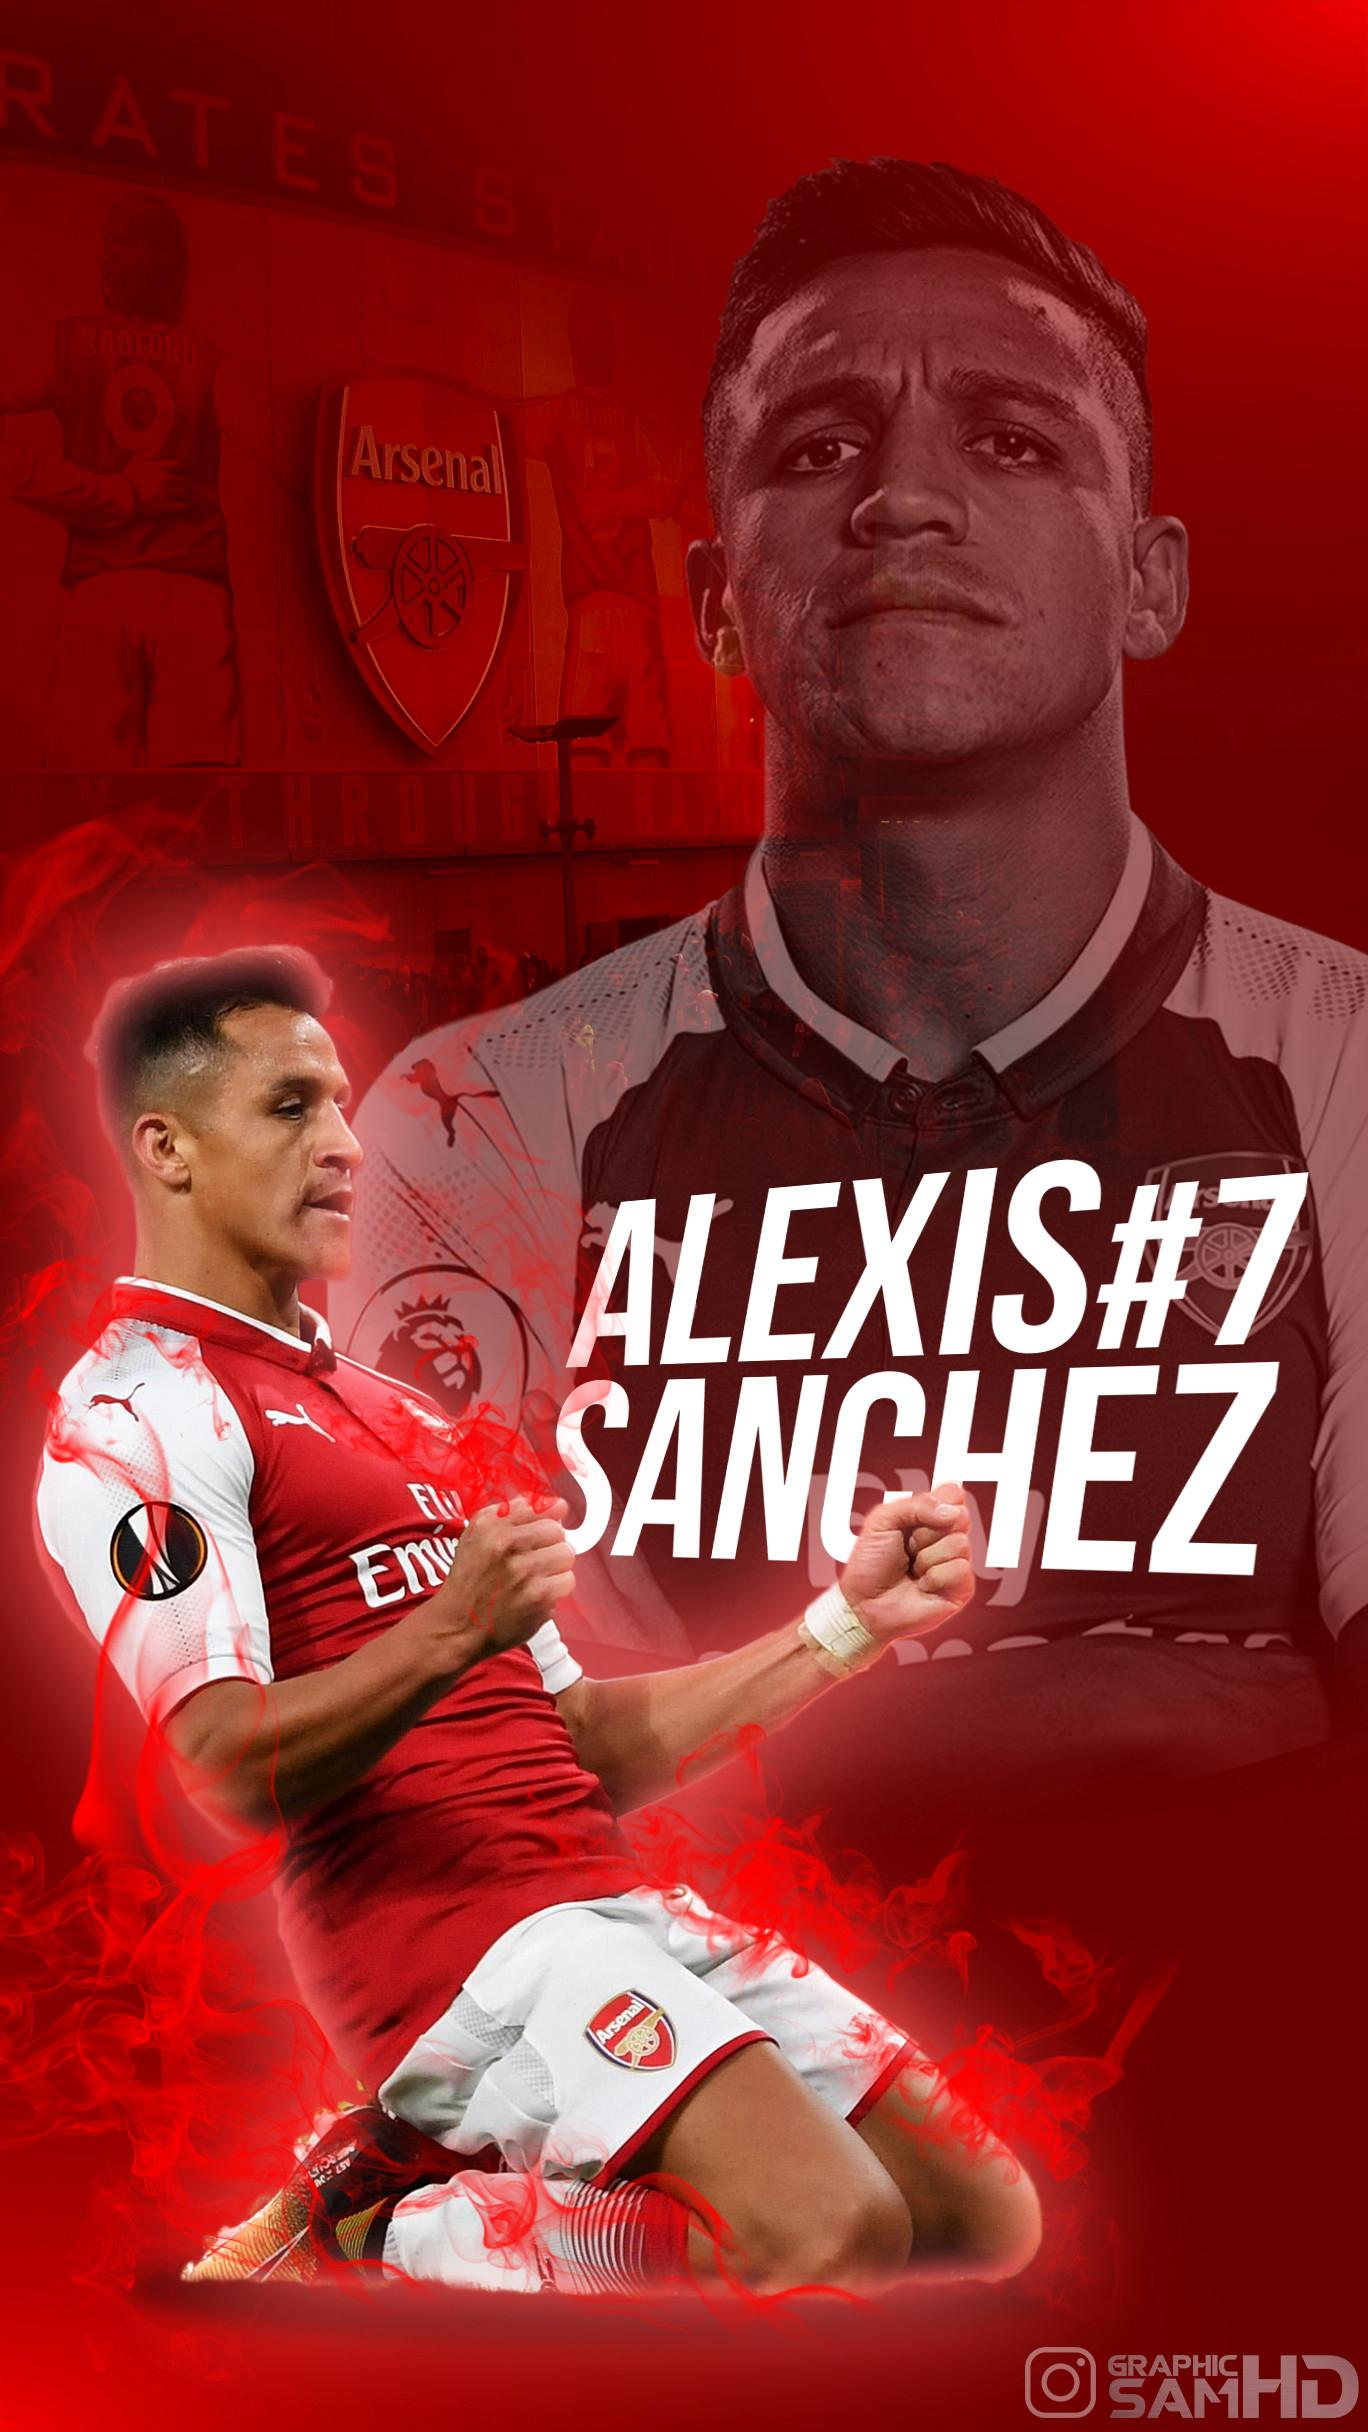 Alexis Alexis Sanchez 2017 2018 404031 Hd Wallpaper